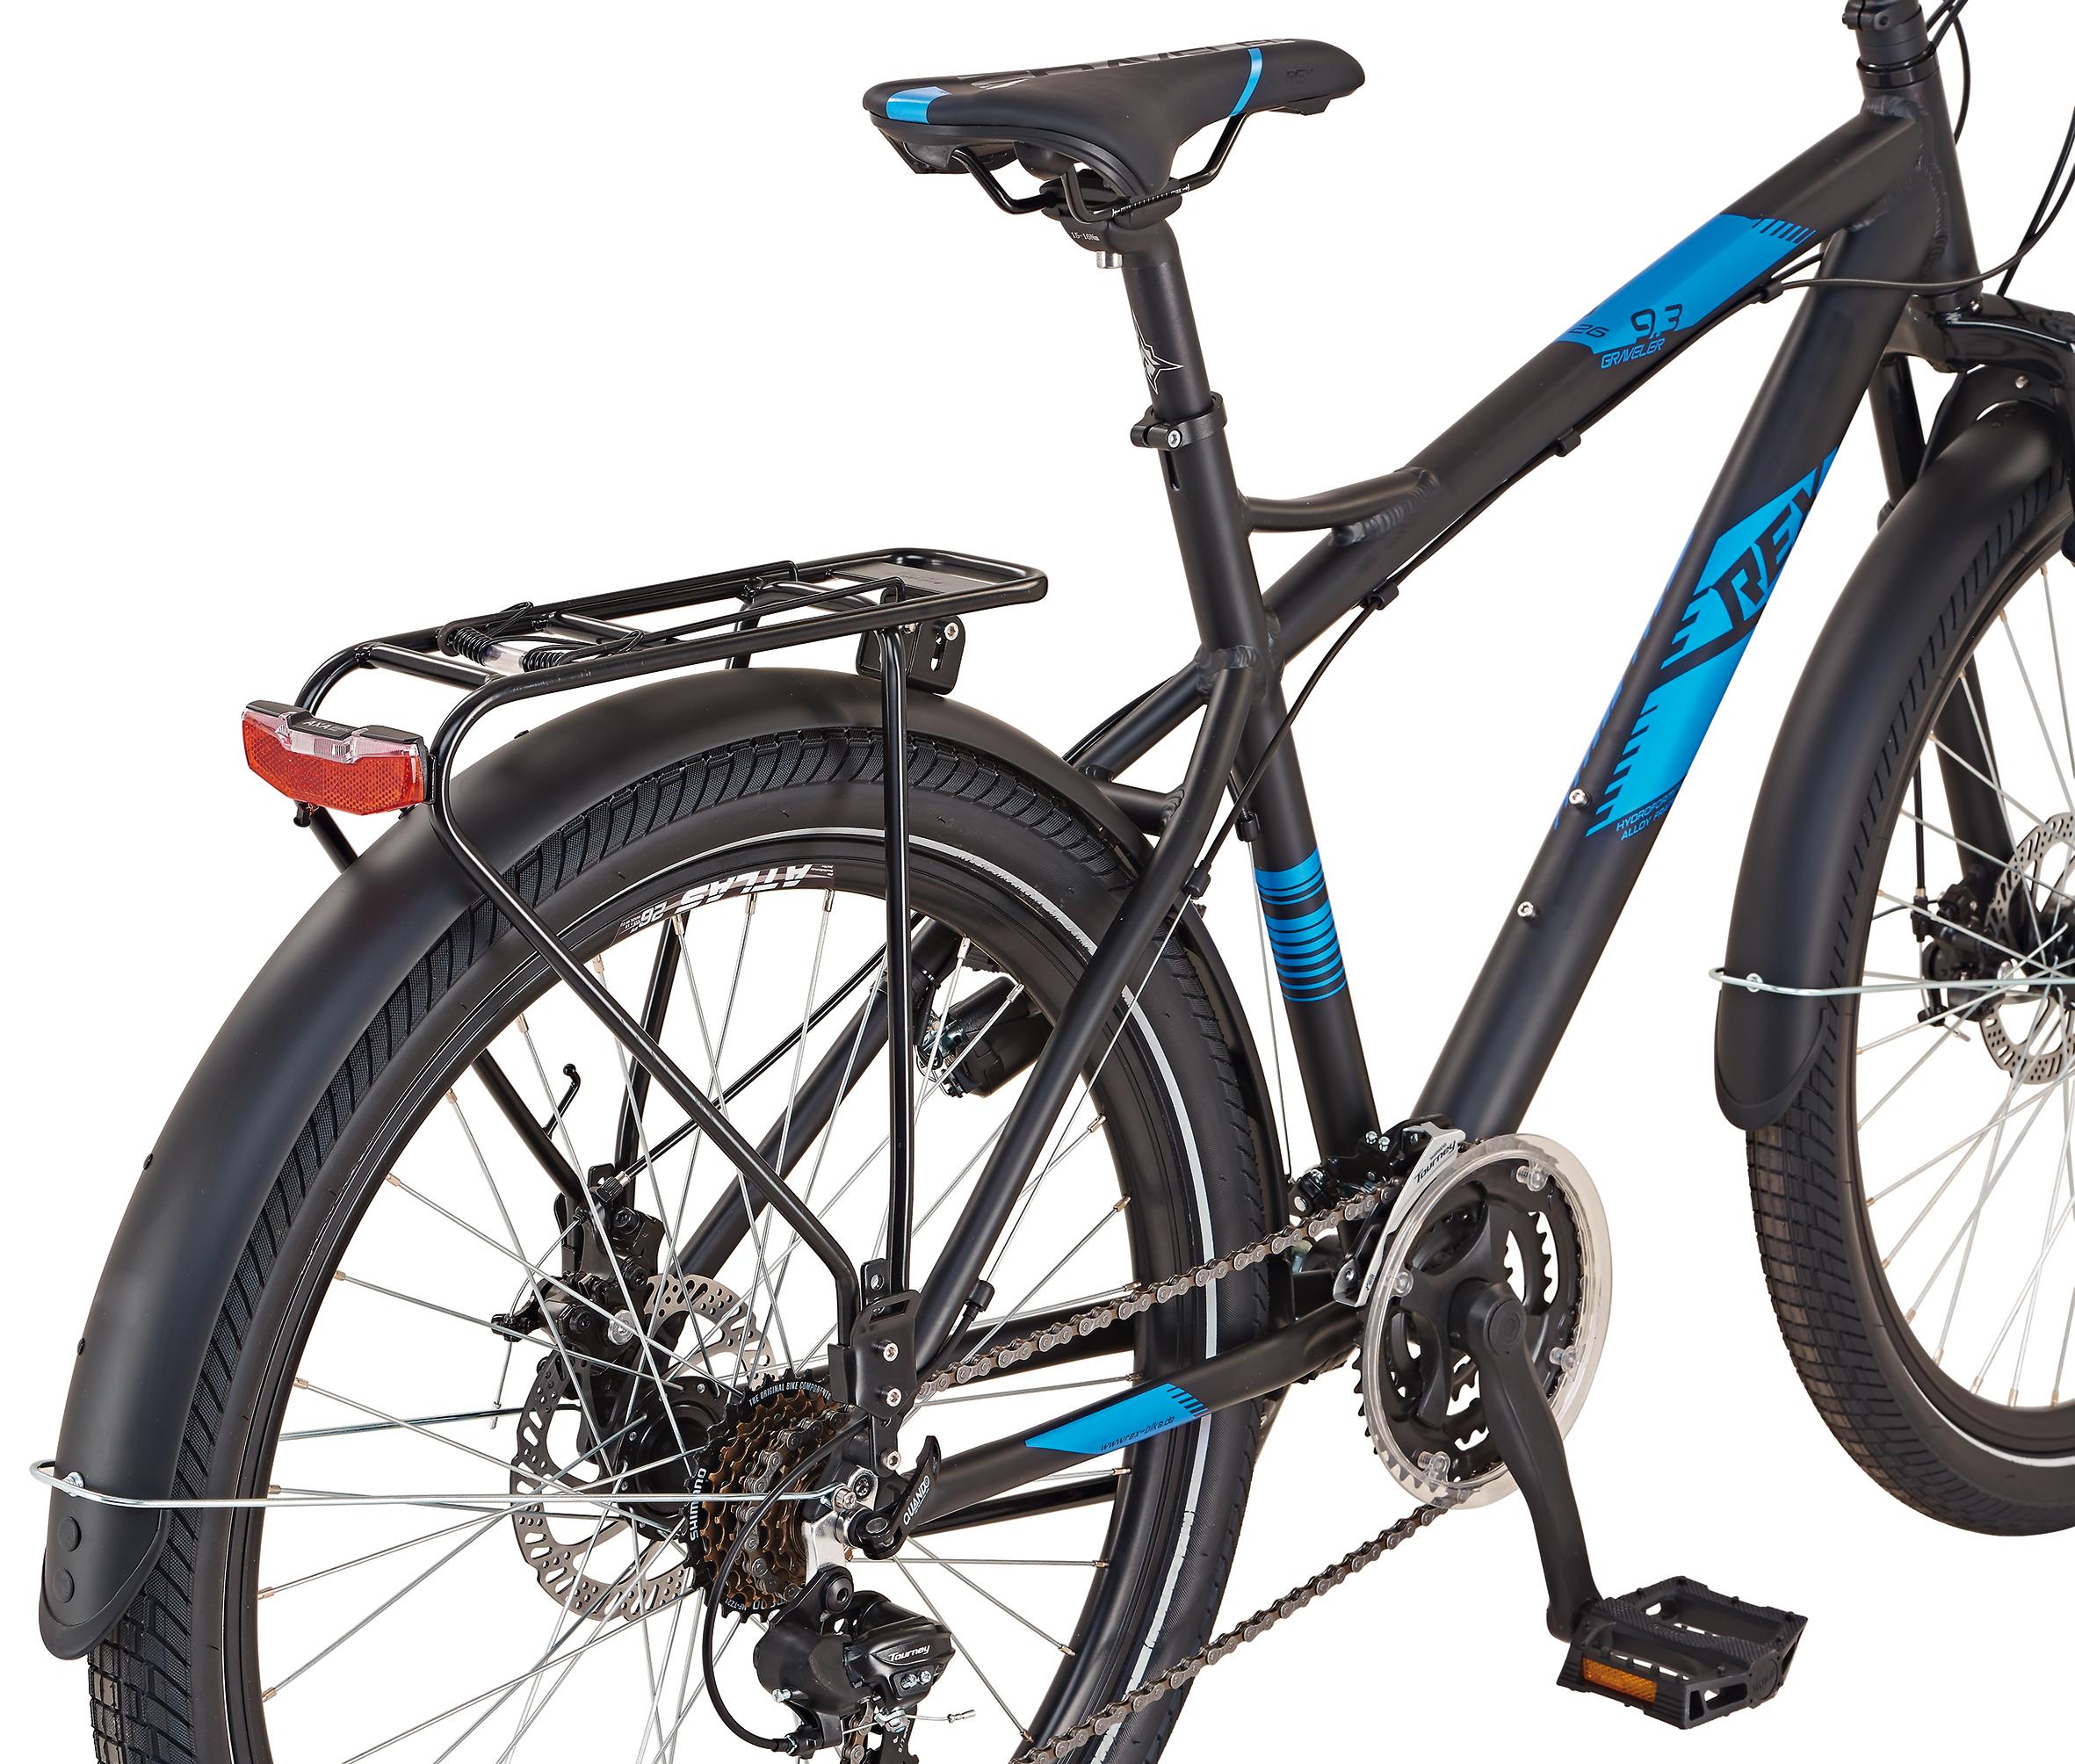 "Rex Bike Fahrrad / All Terrain Bike Graveler 9.3 ATB 26"" Bild 3"